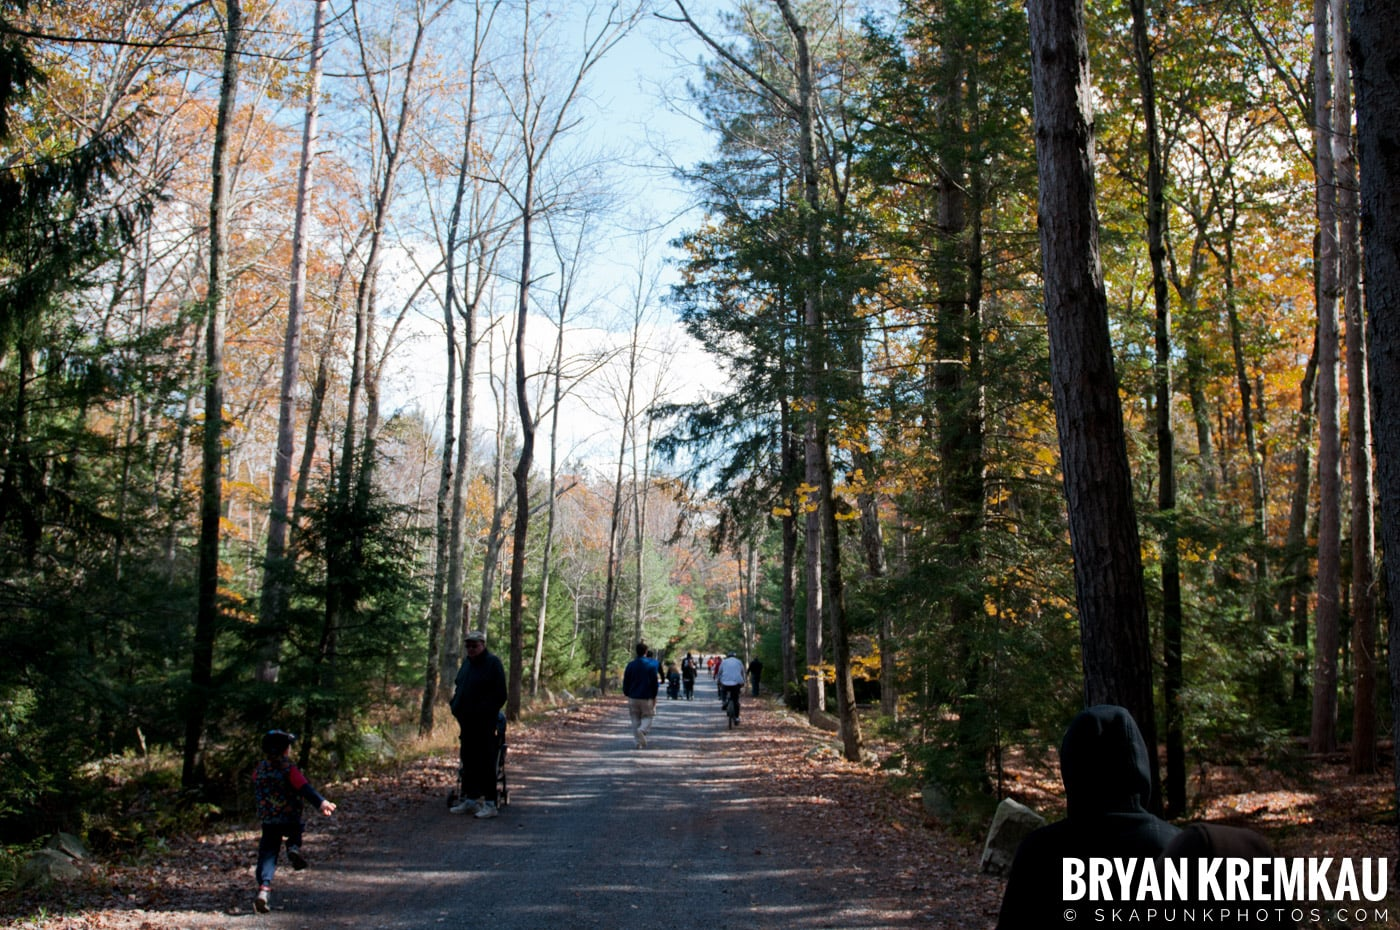 Minnewaska State Park Preserve @ Wawarsing, New York - 10.22.11 (47)